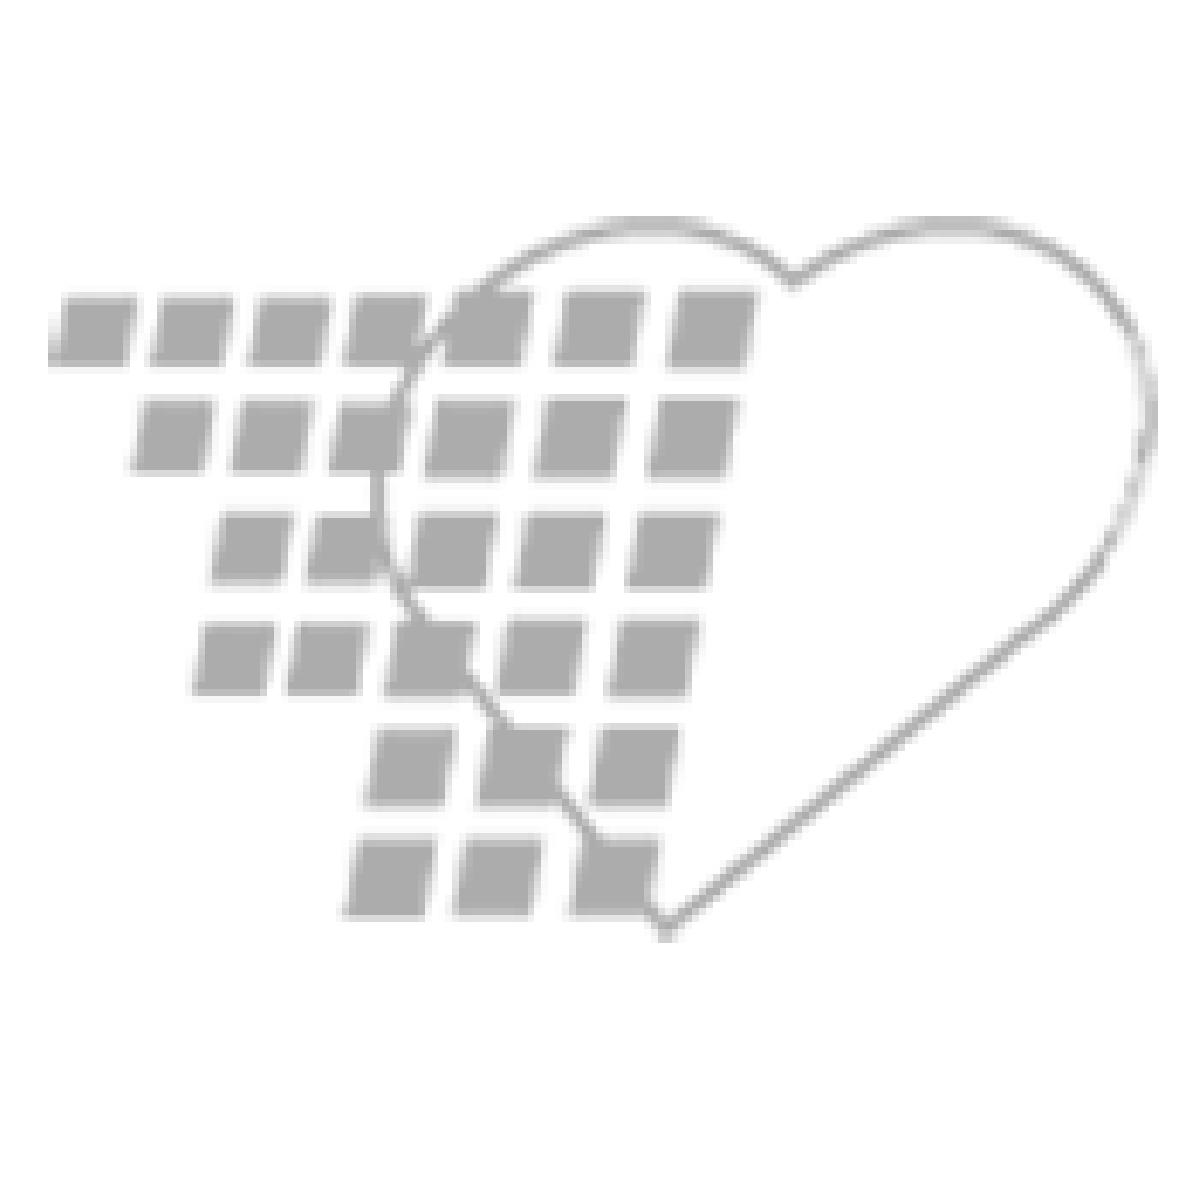 06-33-8220 - HL-I Ninja Compact Pharmacy Scale